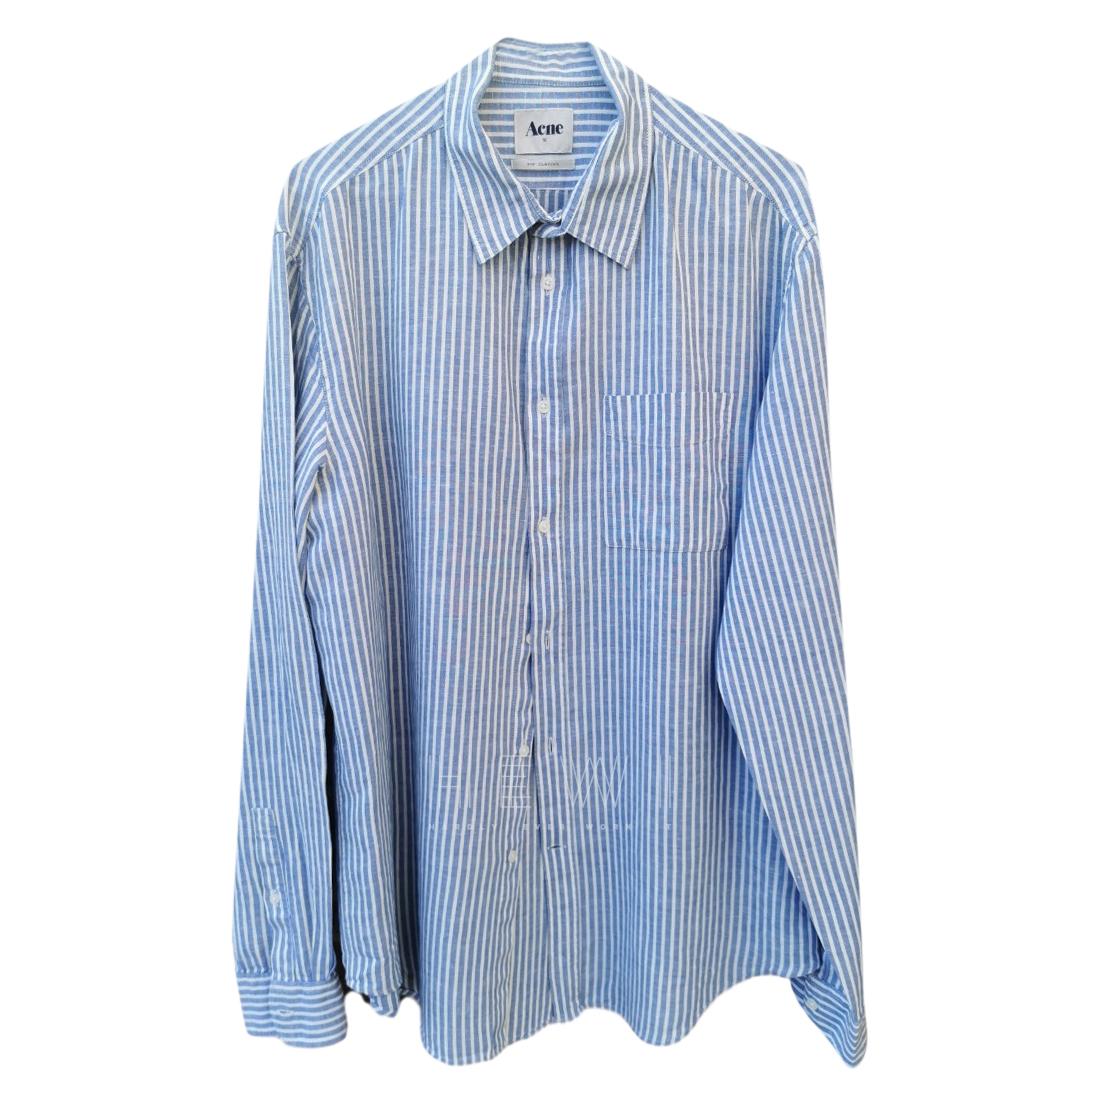 Acne Studio Pop Classic Men's Shirt